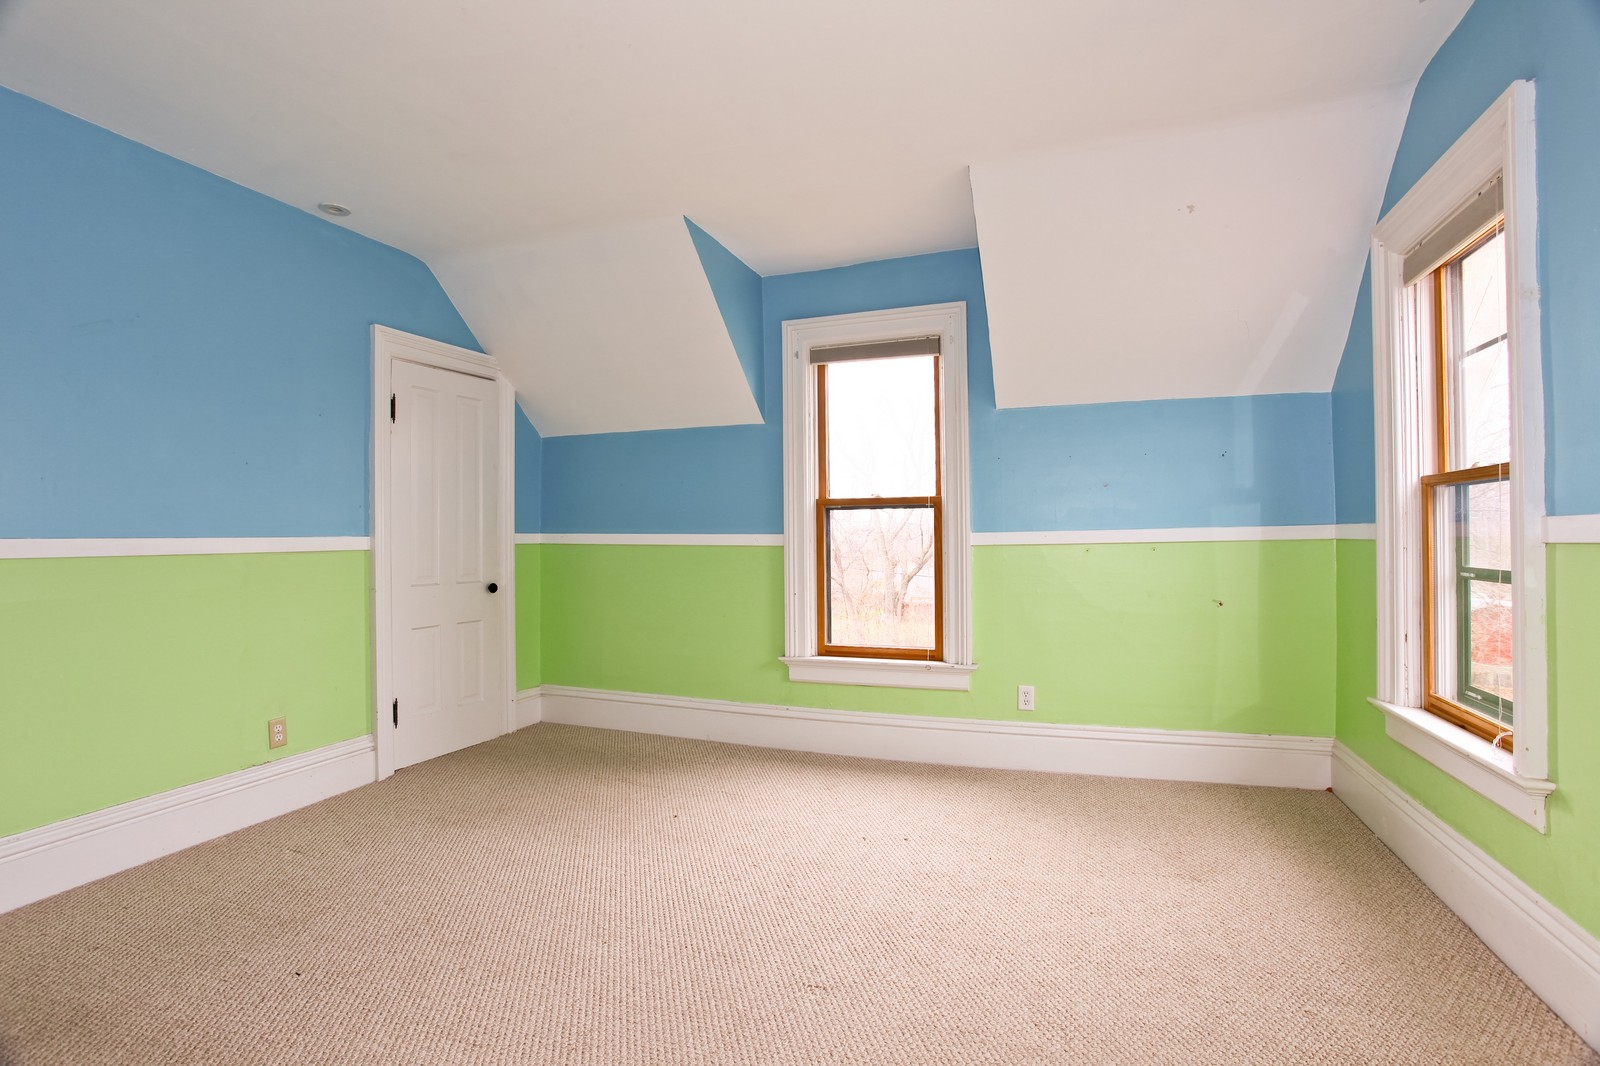 Real Estate Photography - 1126 Main St, Batavia, IL, 60510 - Bedroom